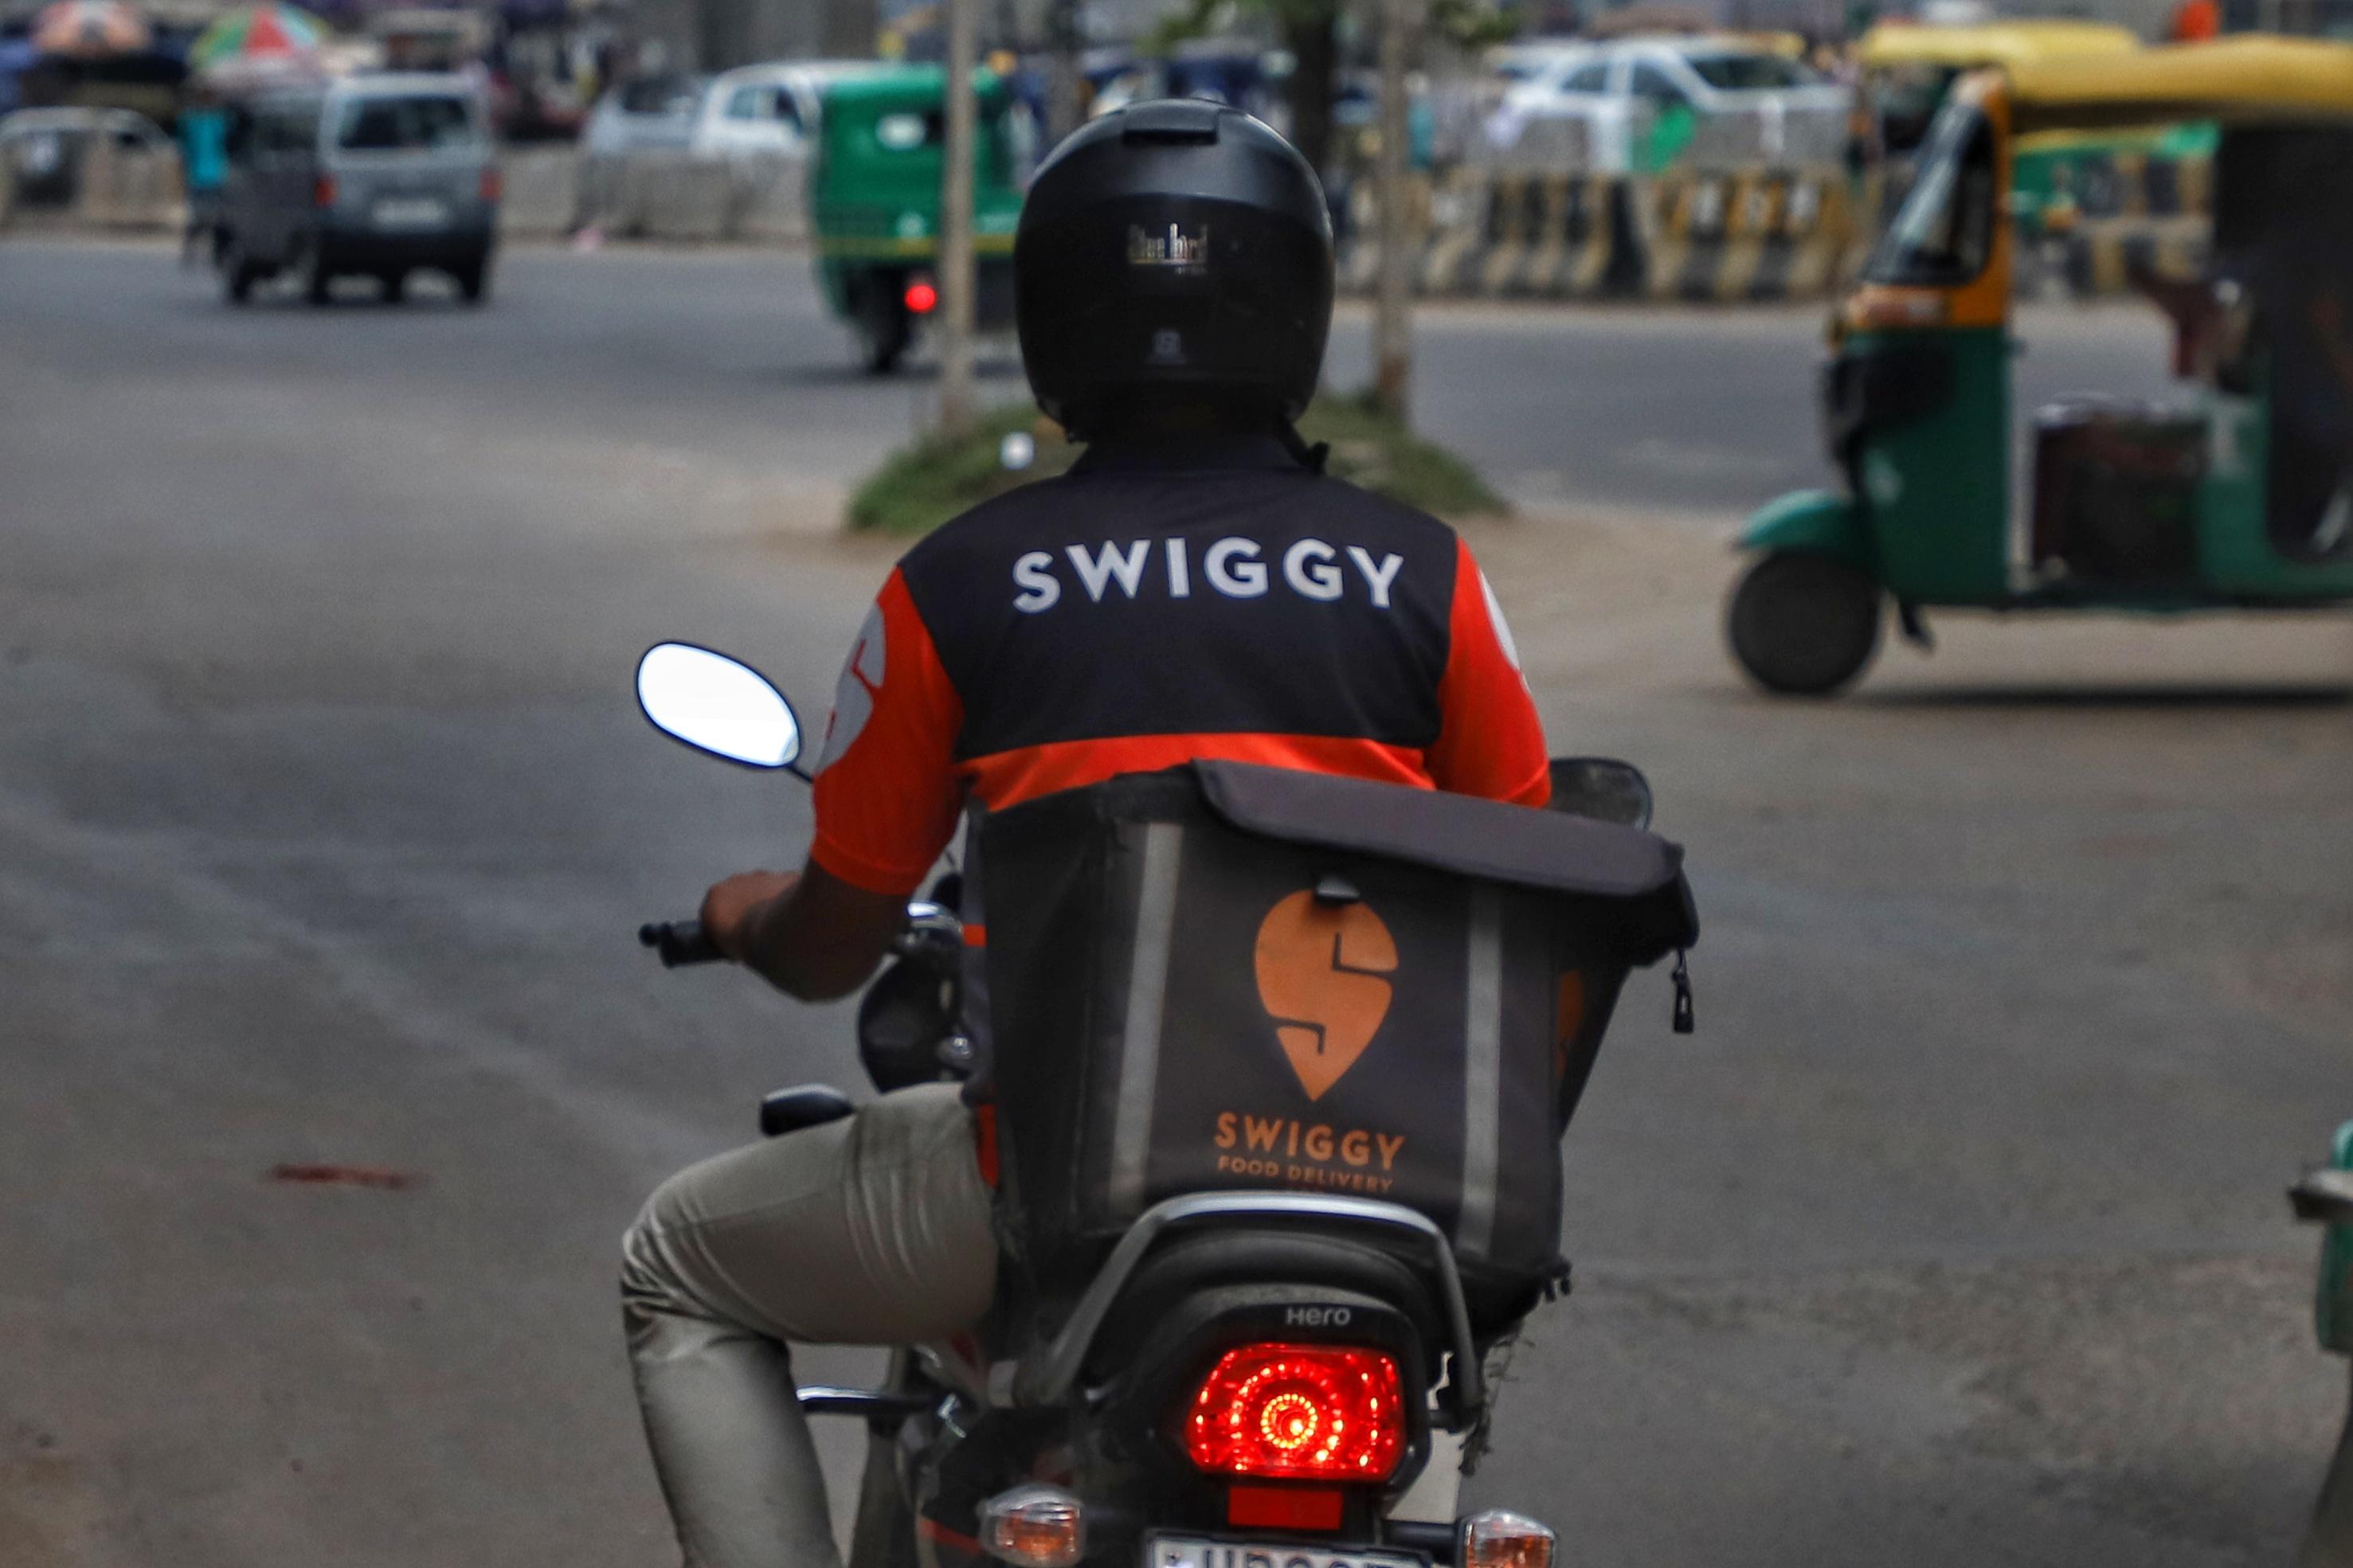 India's Swiggy raises $113M led by Prosus | TechCrunch